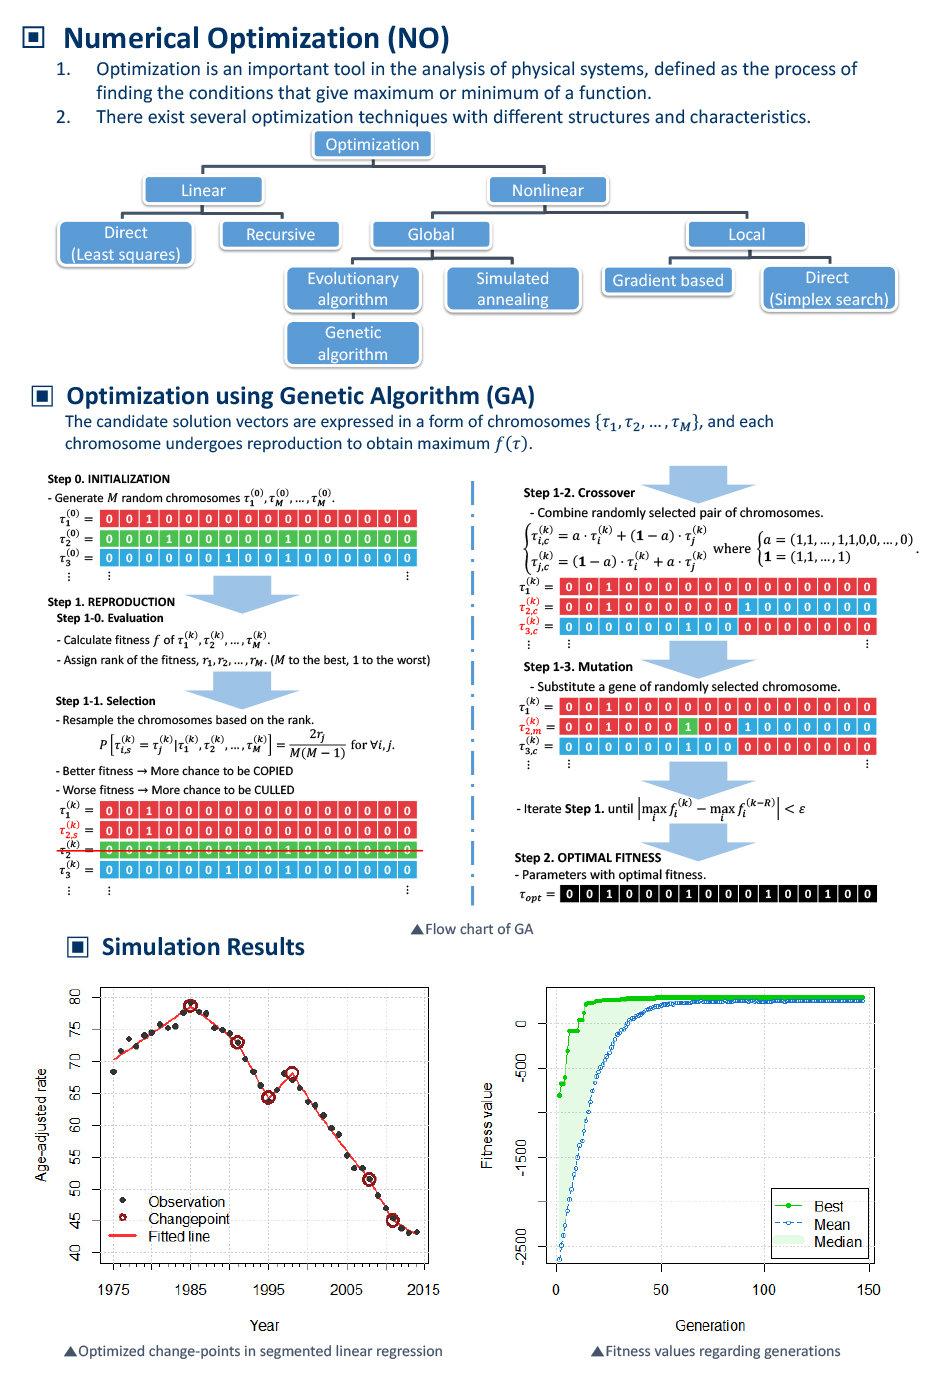 Numerical Optimization (Genetic Algorith